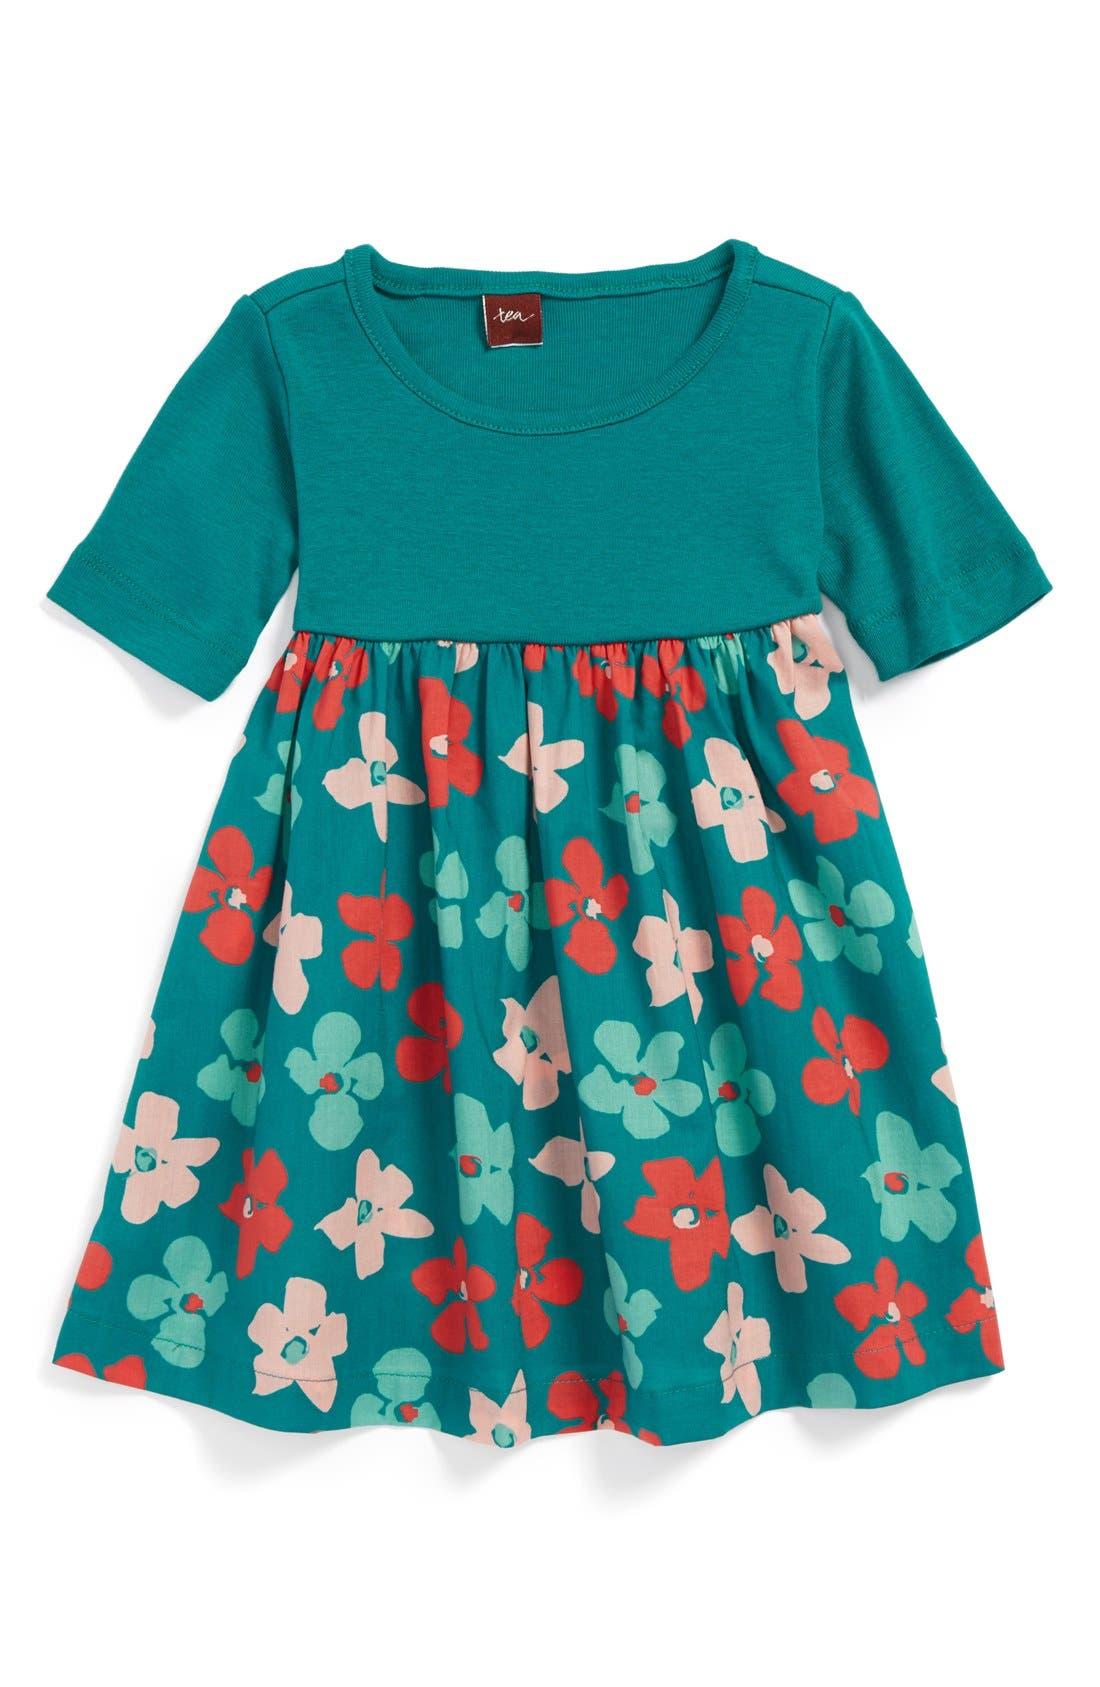 Main Image - Tea Collection 'Stiefmütterchen' Cotton Dress (Baby Girls)